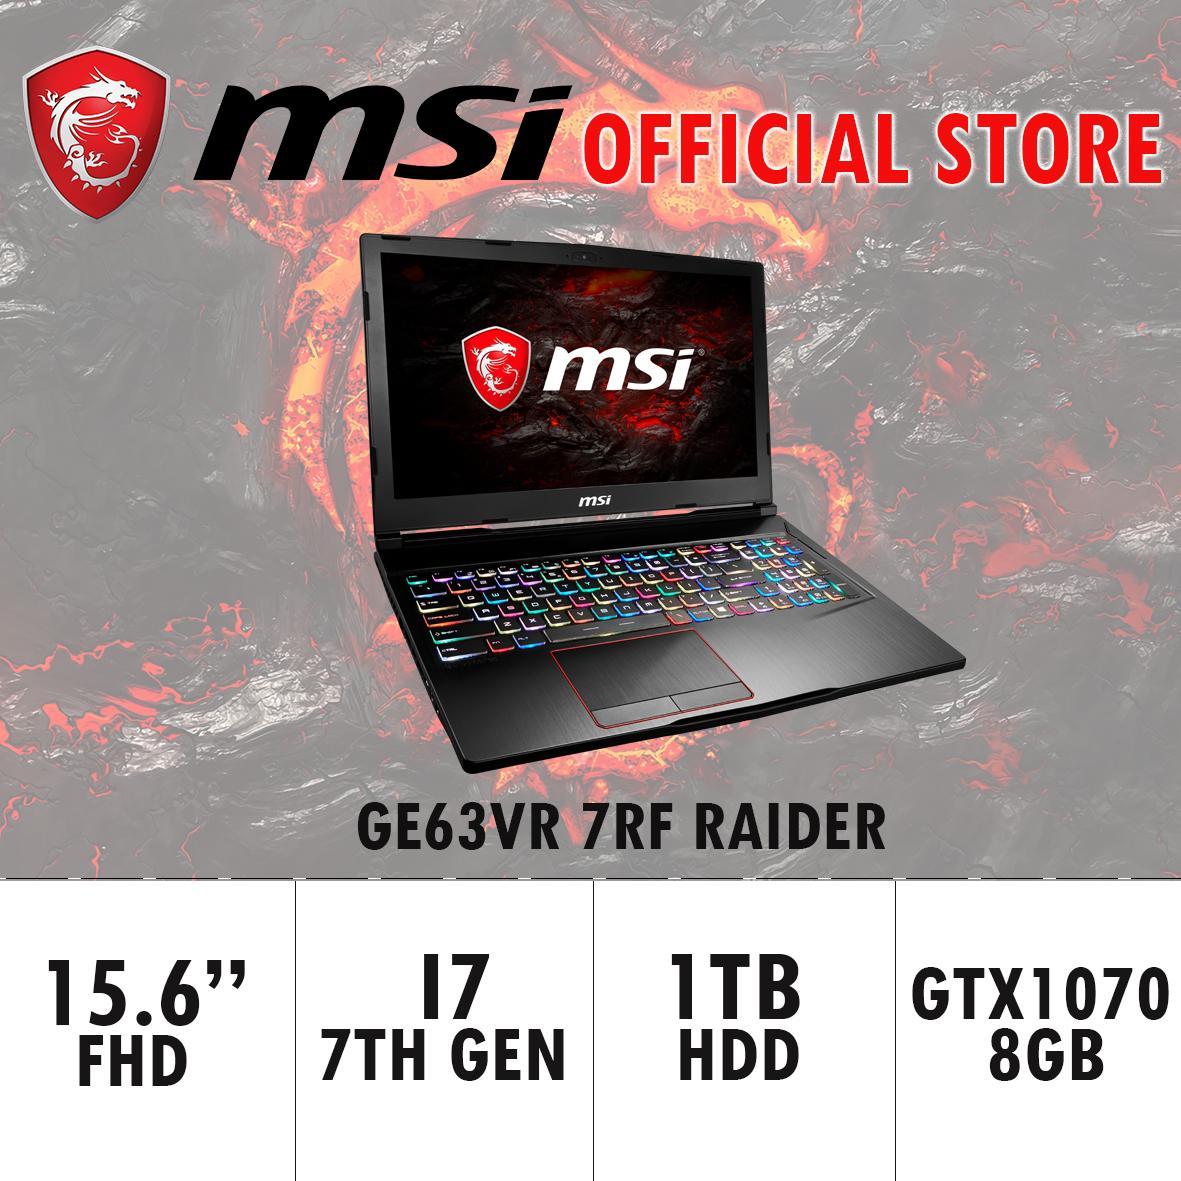 MSI GE63VR 7RF RAIDER - 262SG (I7-7700HQ/16GB DDR4/256GB SSD+1TB HDD 7200RPM/8GB NVIDIA GTX1070) GAMING LAPTOP